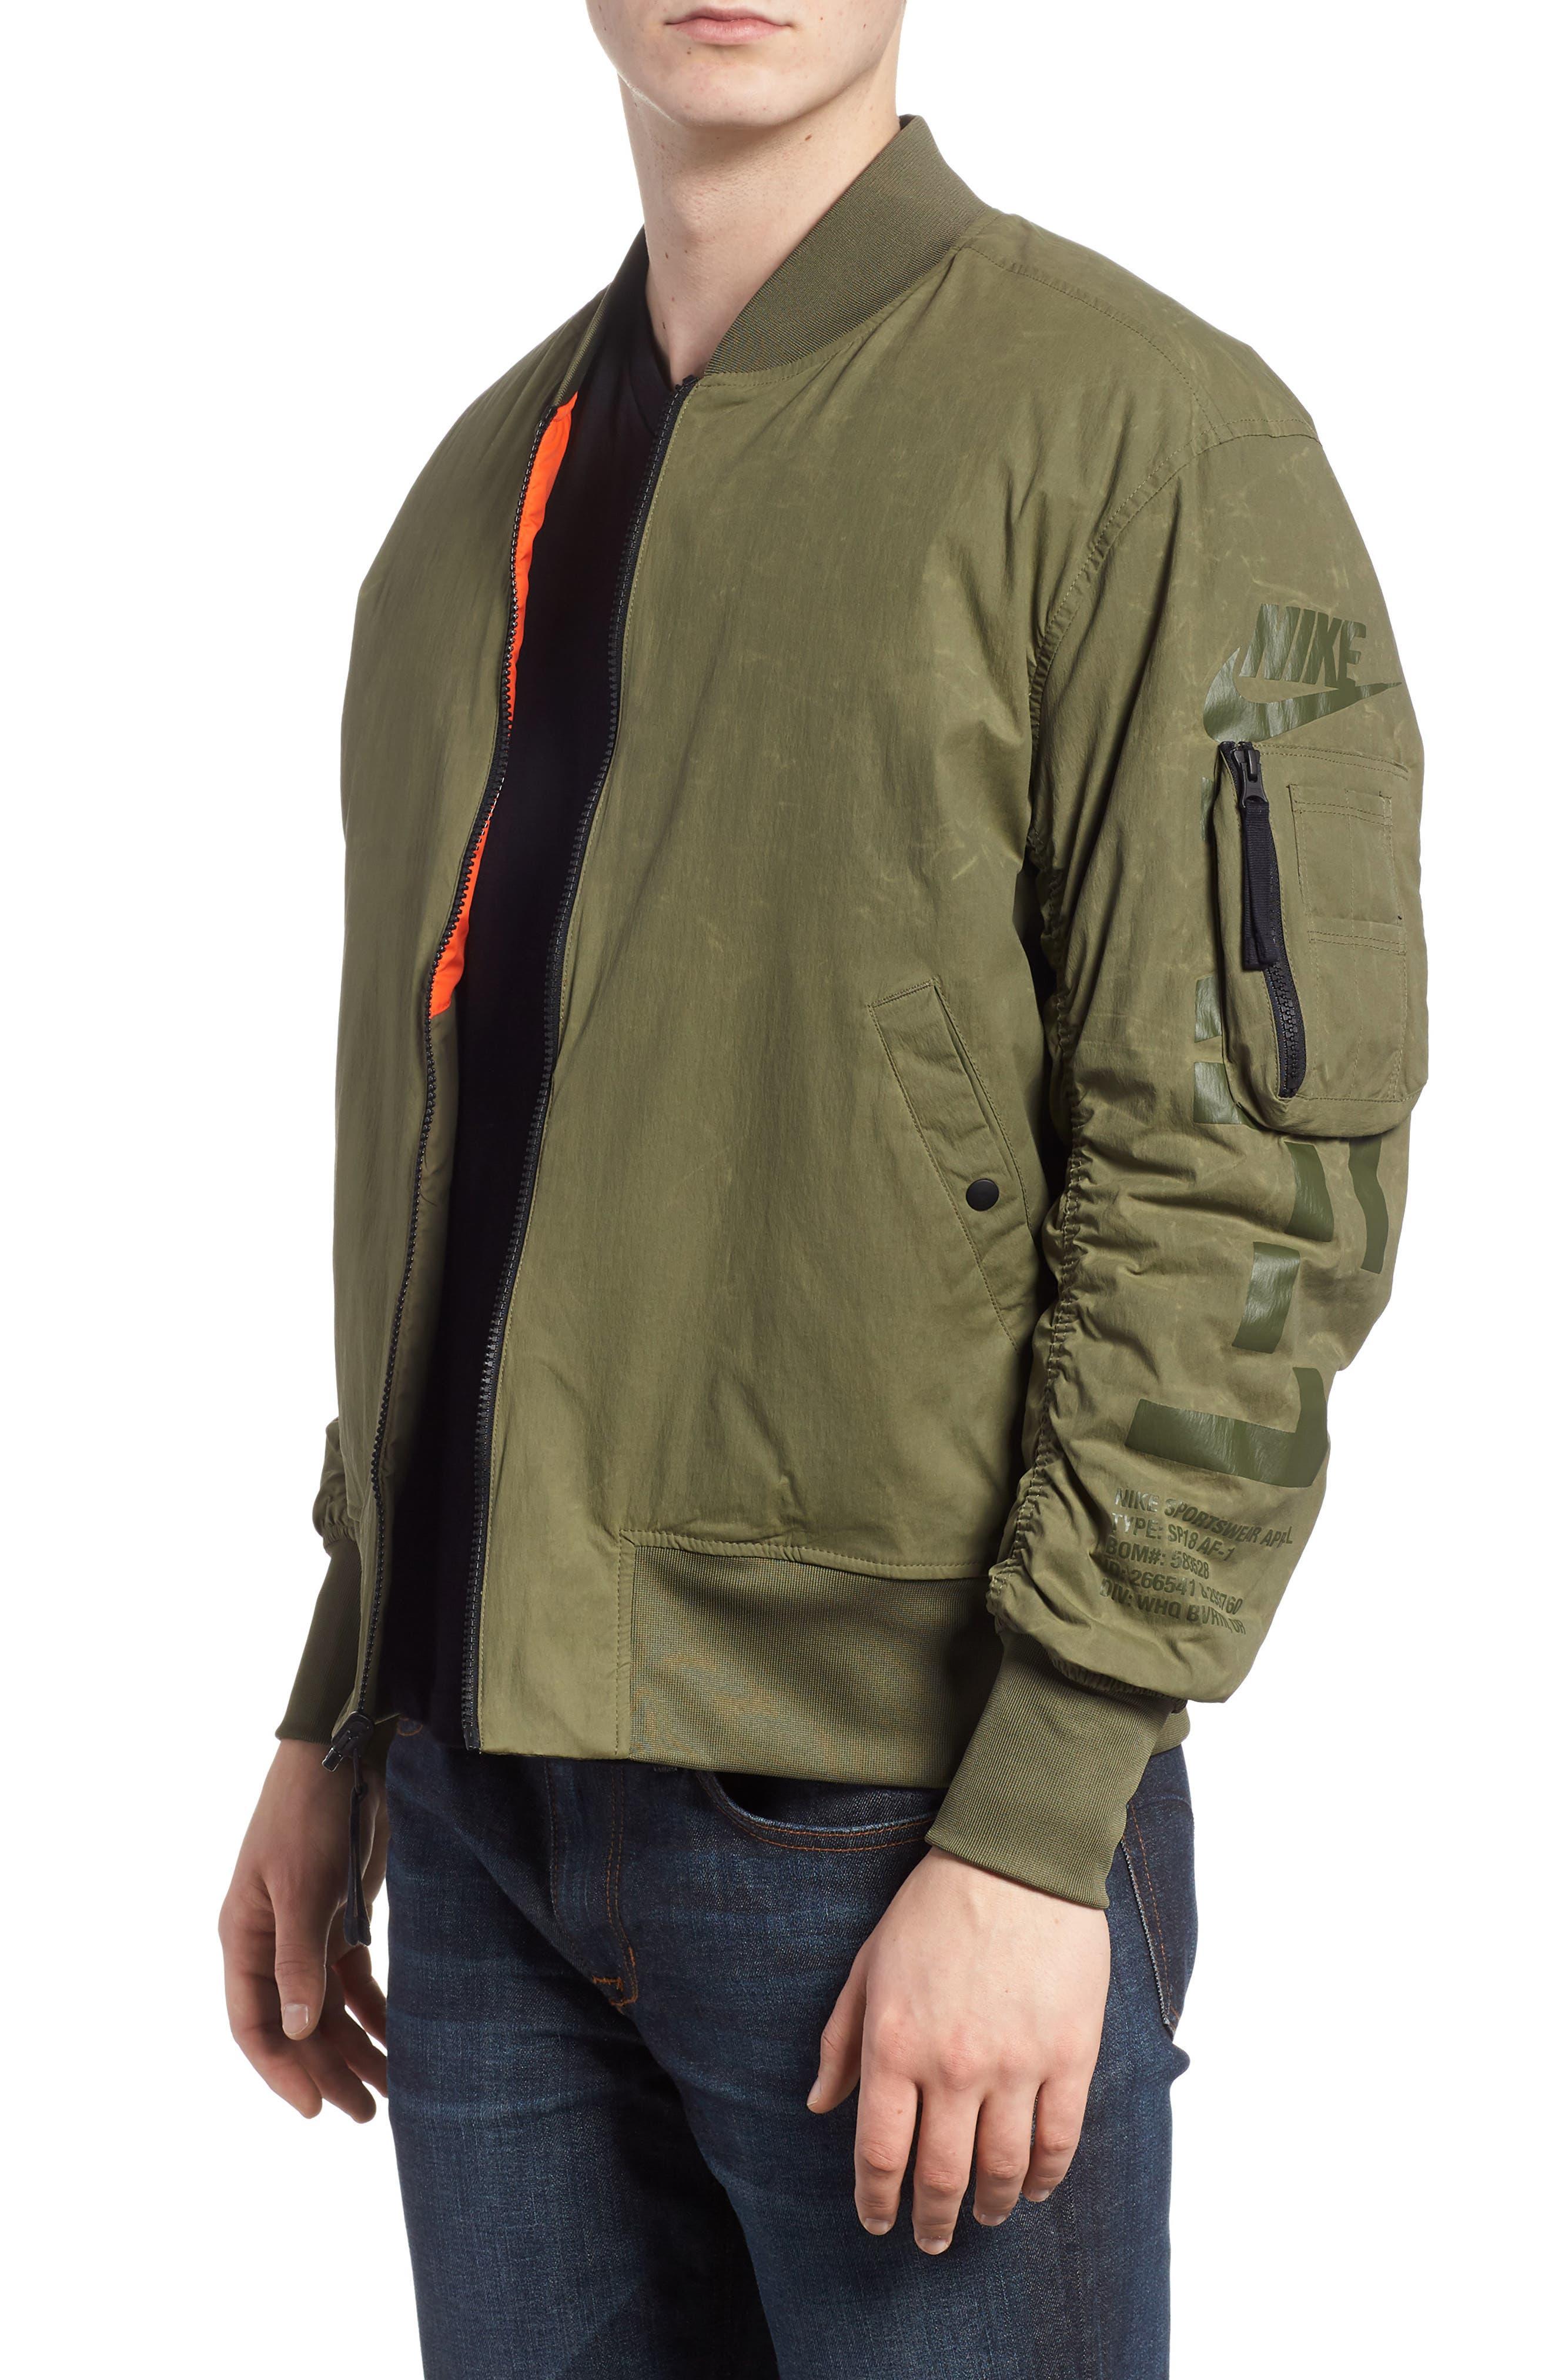 NSW Air Force 1 Jacket,                             Alternate thumbnail 5, color,                             Medium Olive/ Orange/ Olive